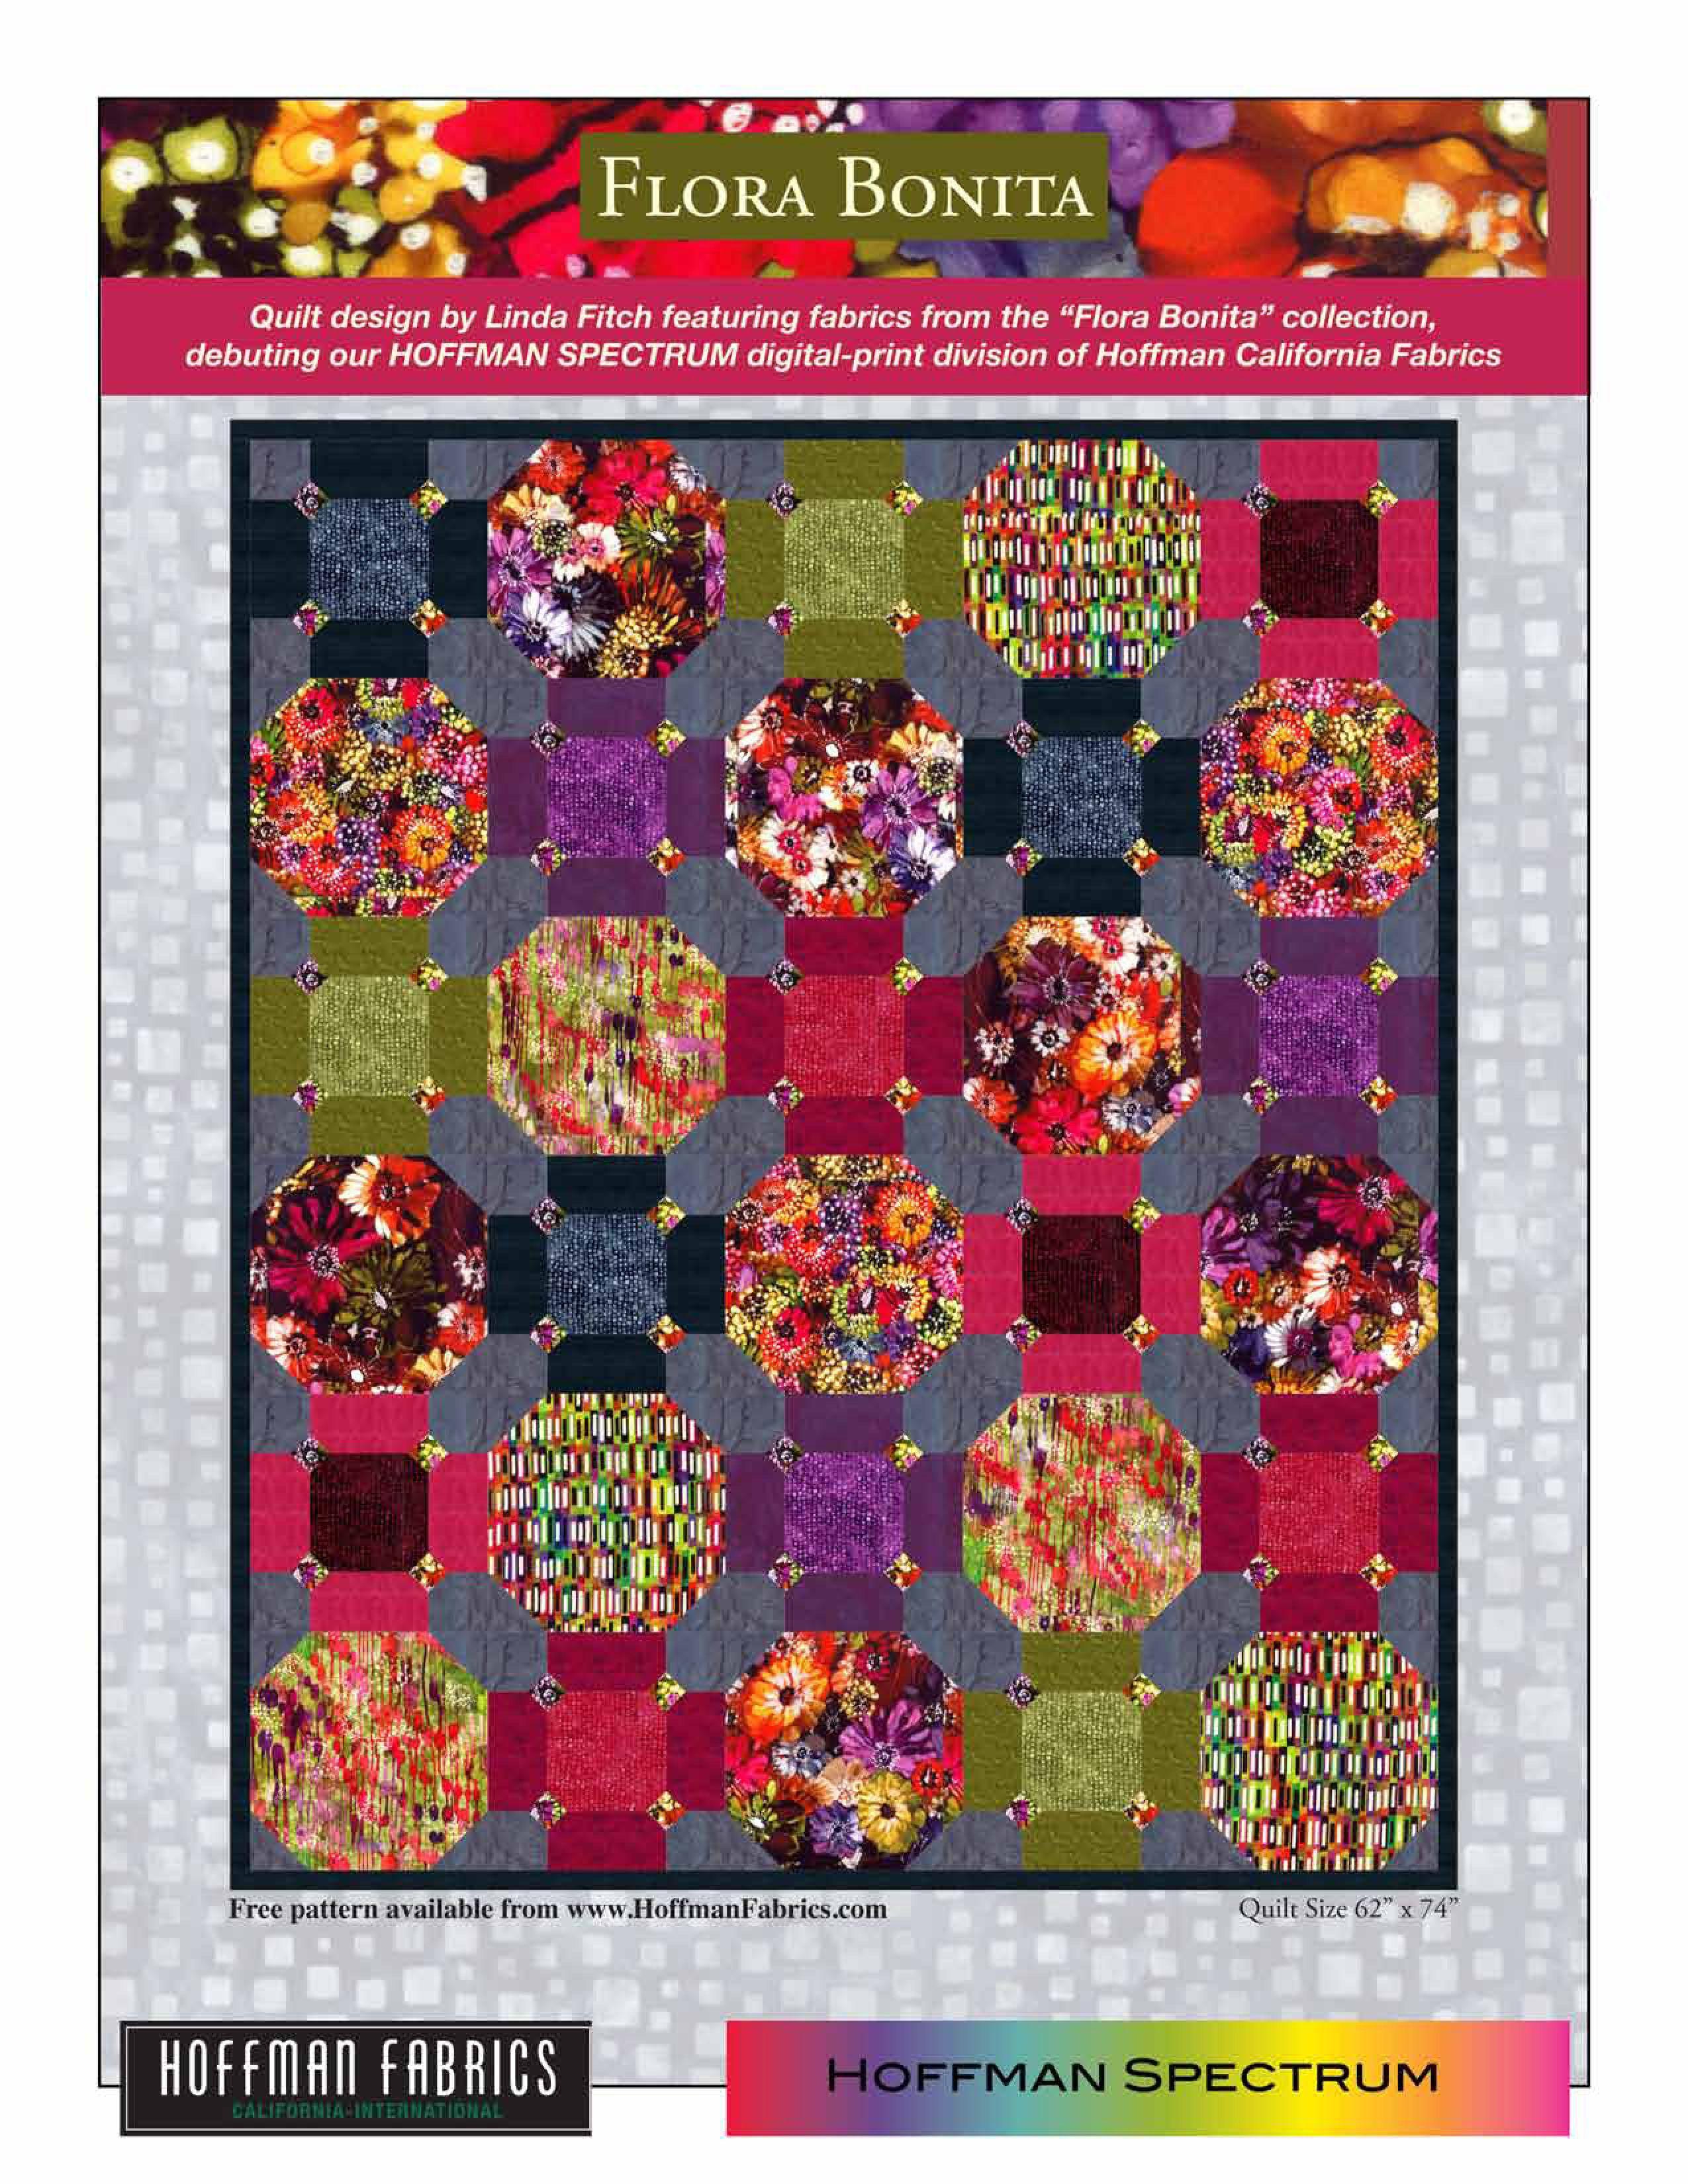 Flora Bonita by Hoffman Fabrics. FREE quilt pattern available at ... : hoffman free quilt patterns - Adamdwight.com